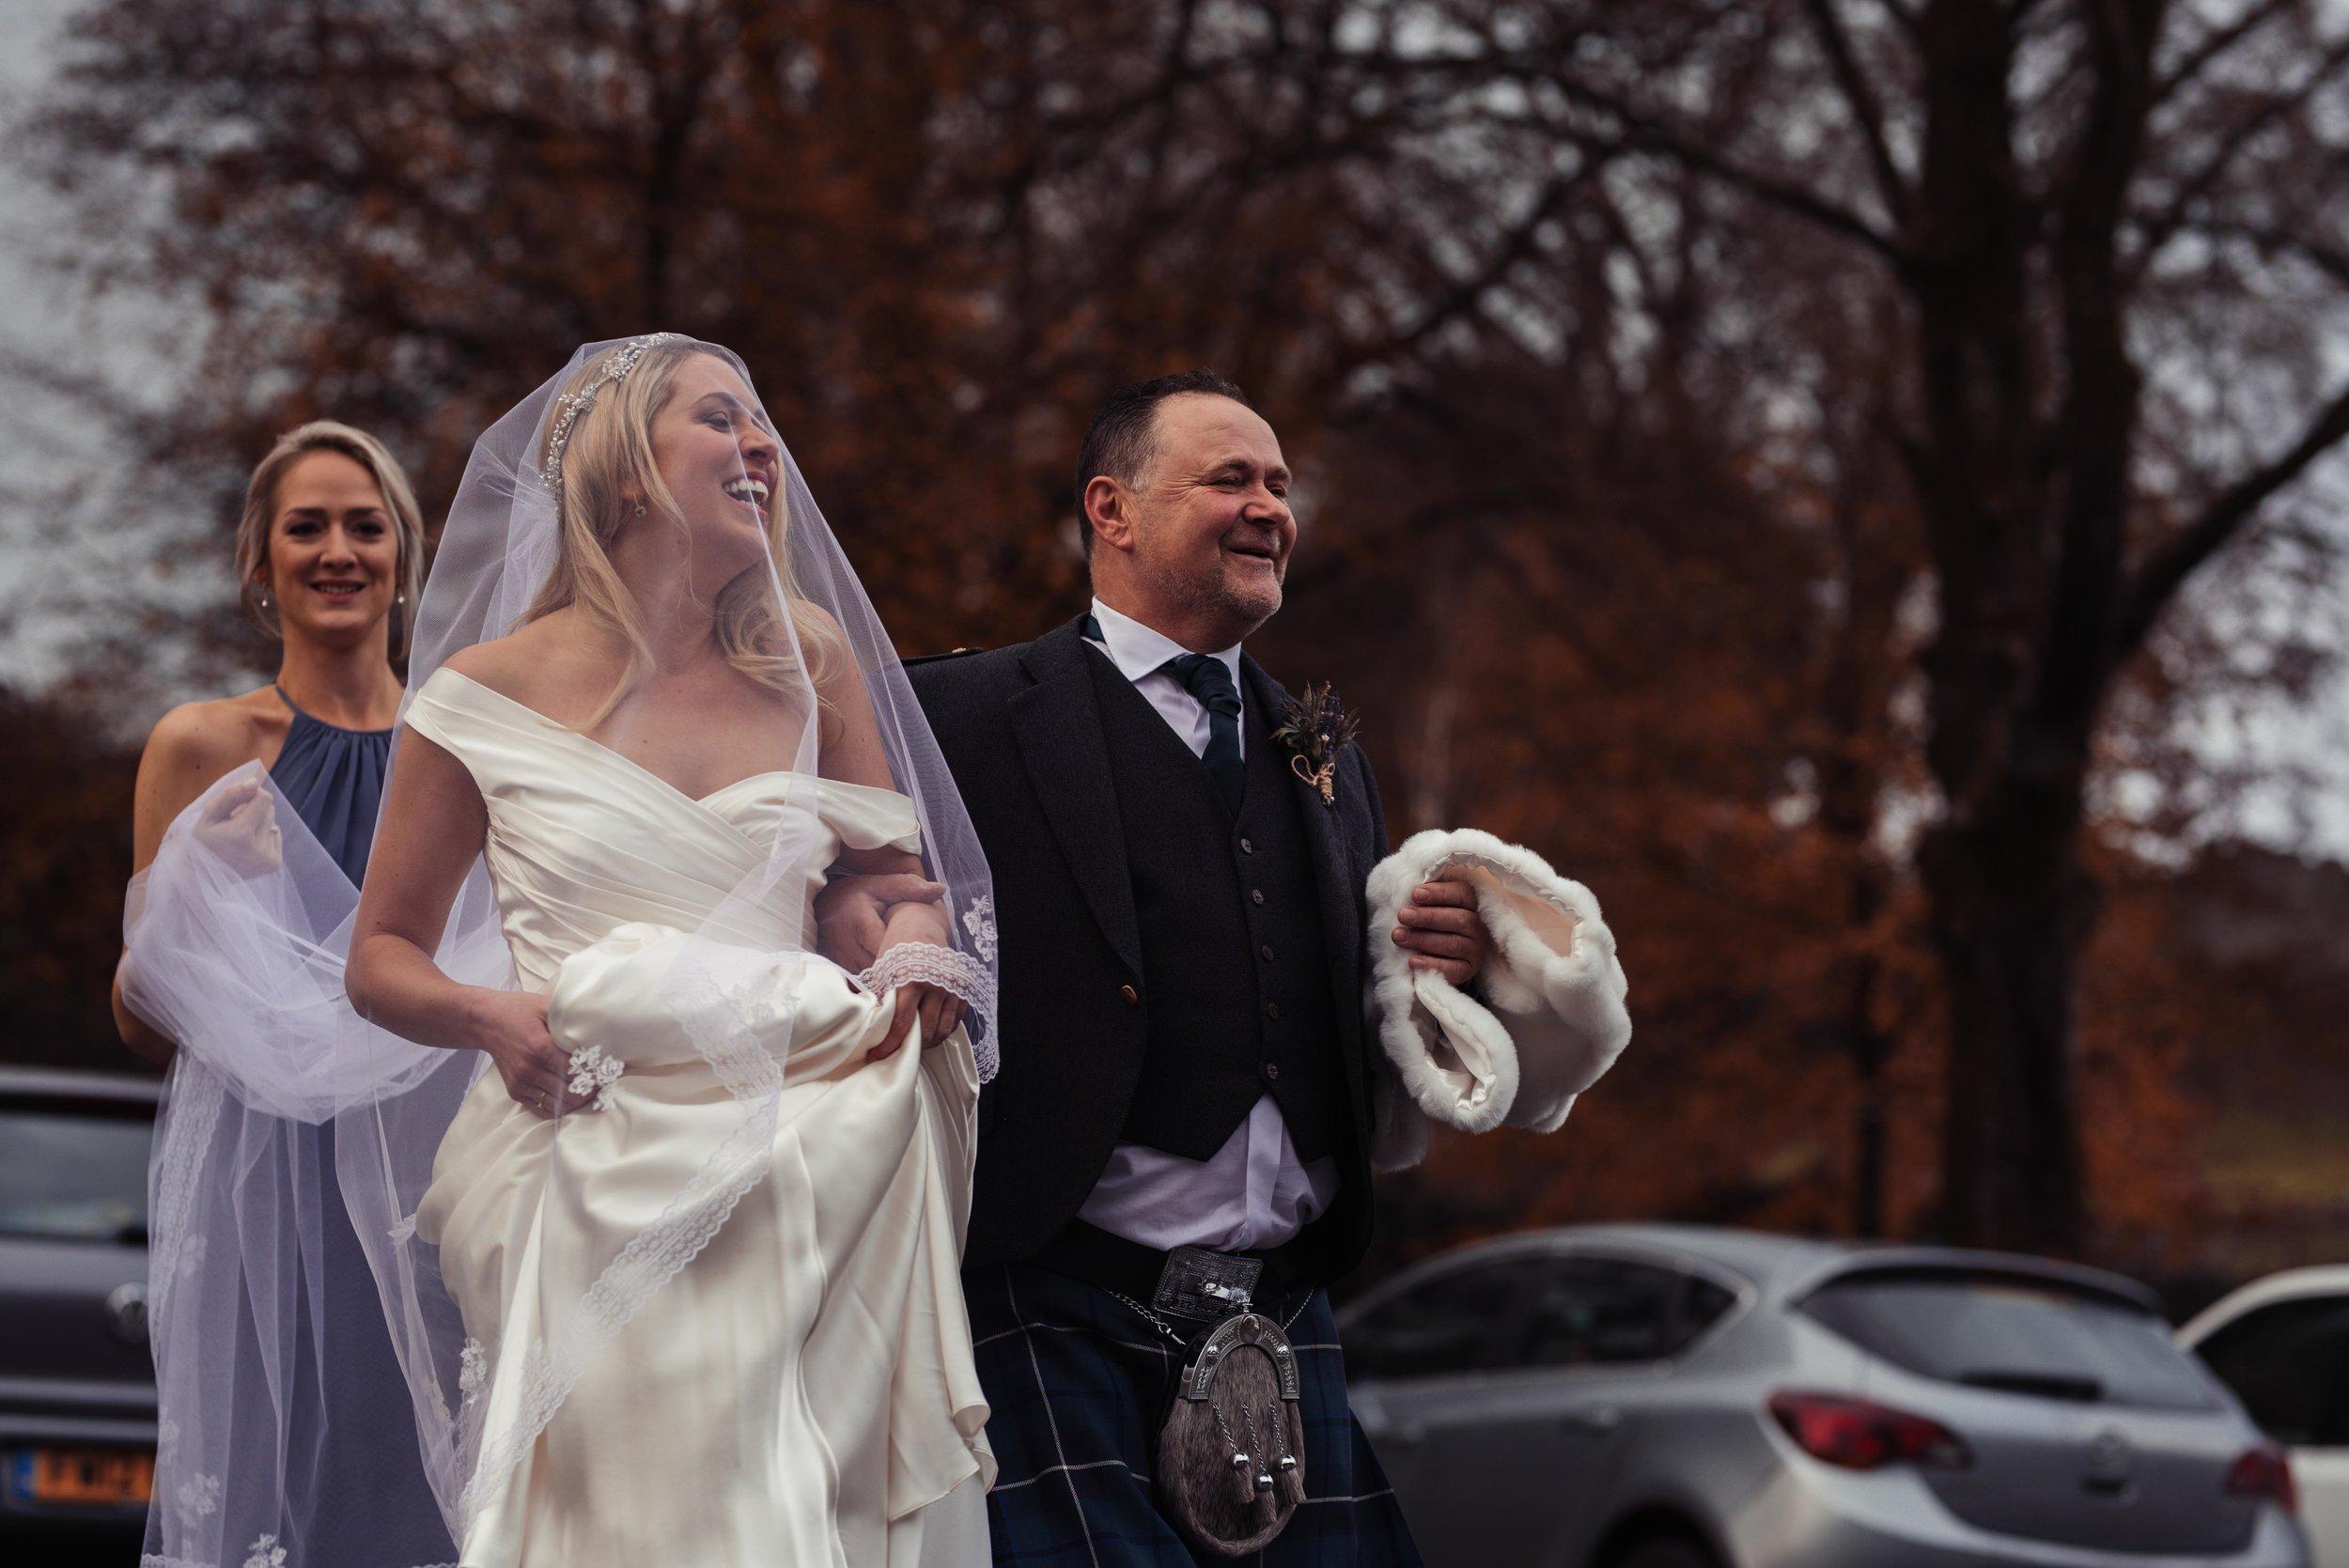 Askham-Hall-Wedding-Photography-24.jpg